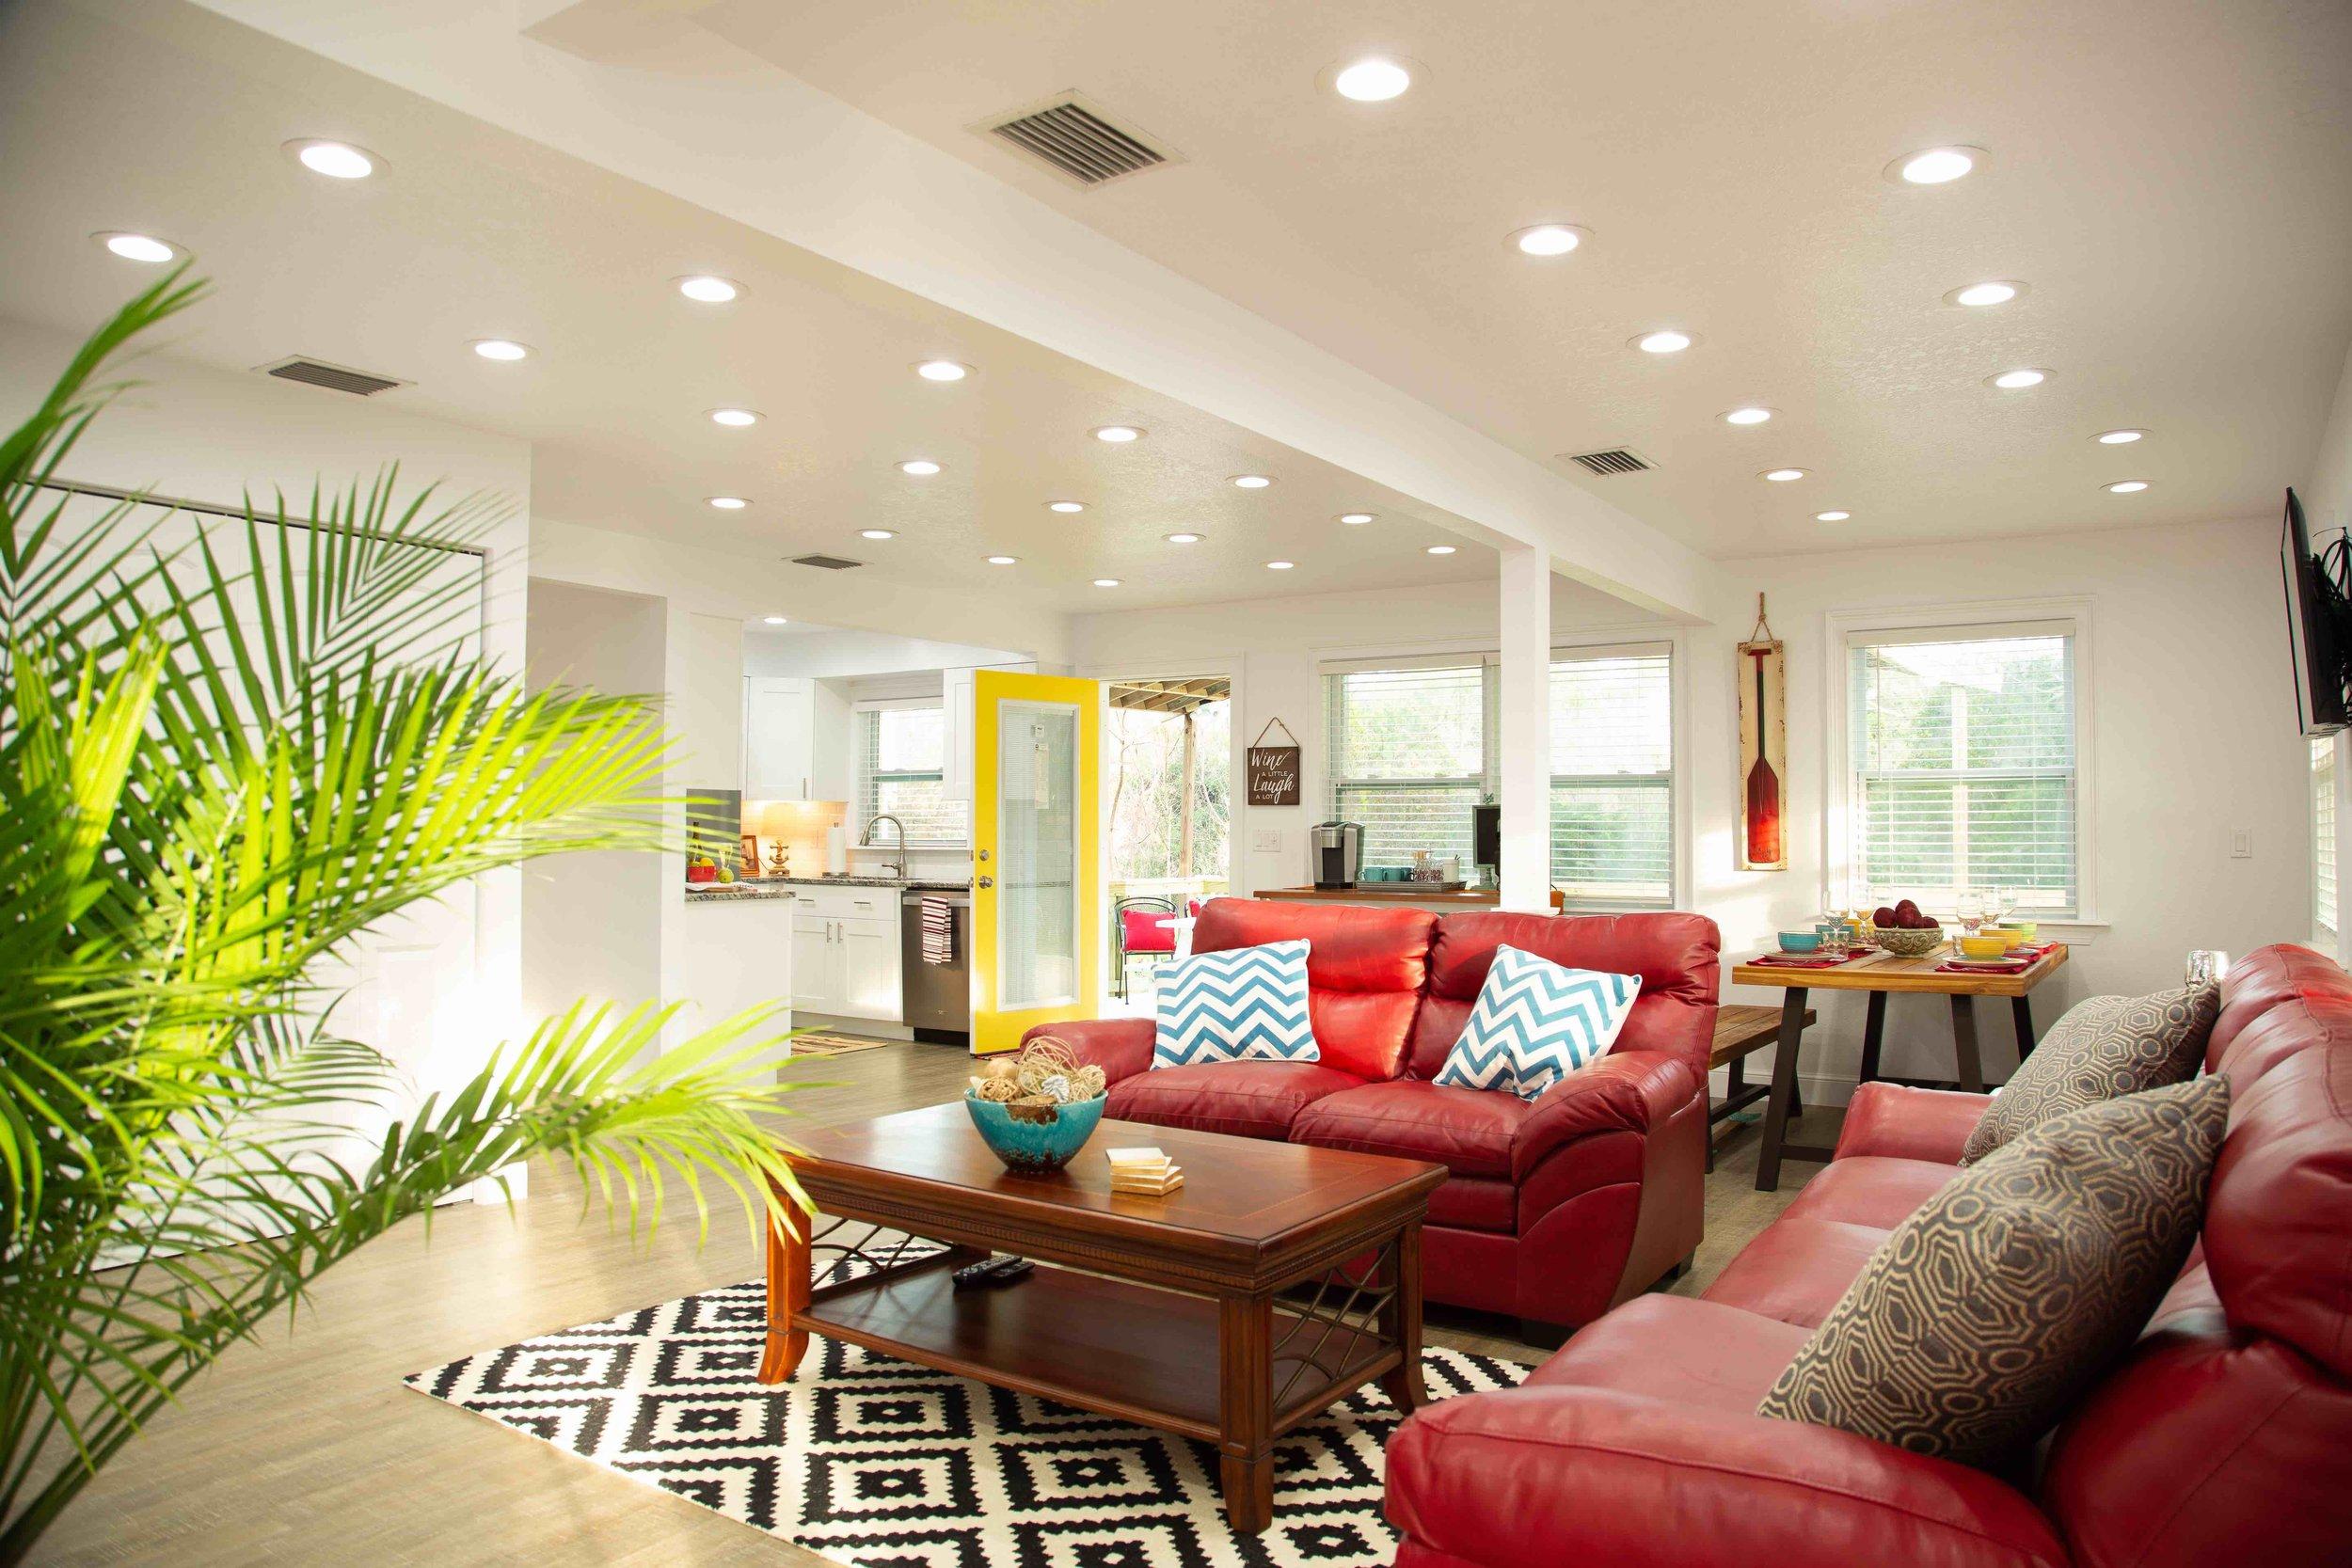 LivingroomWithGreenPlant2.jpg